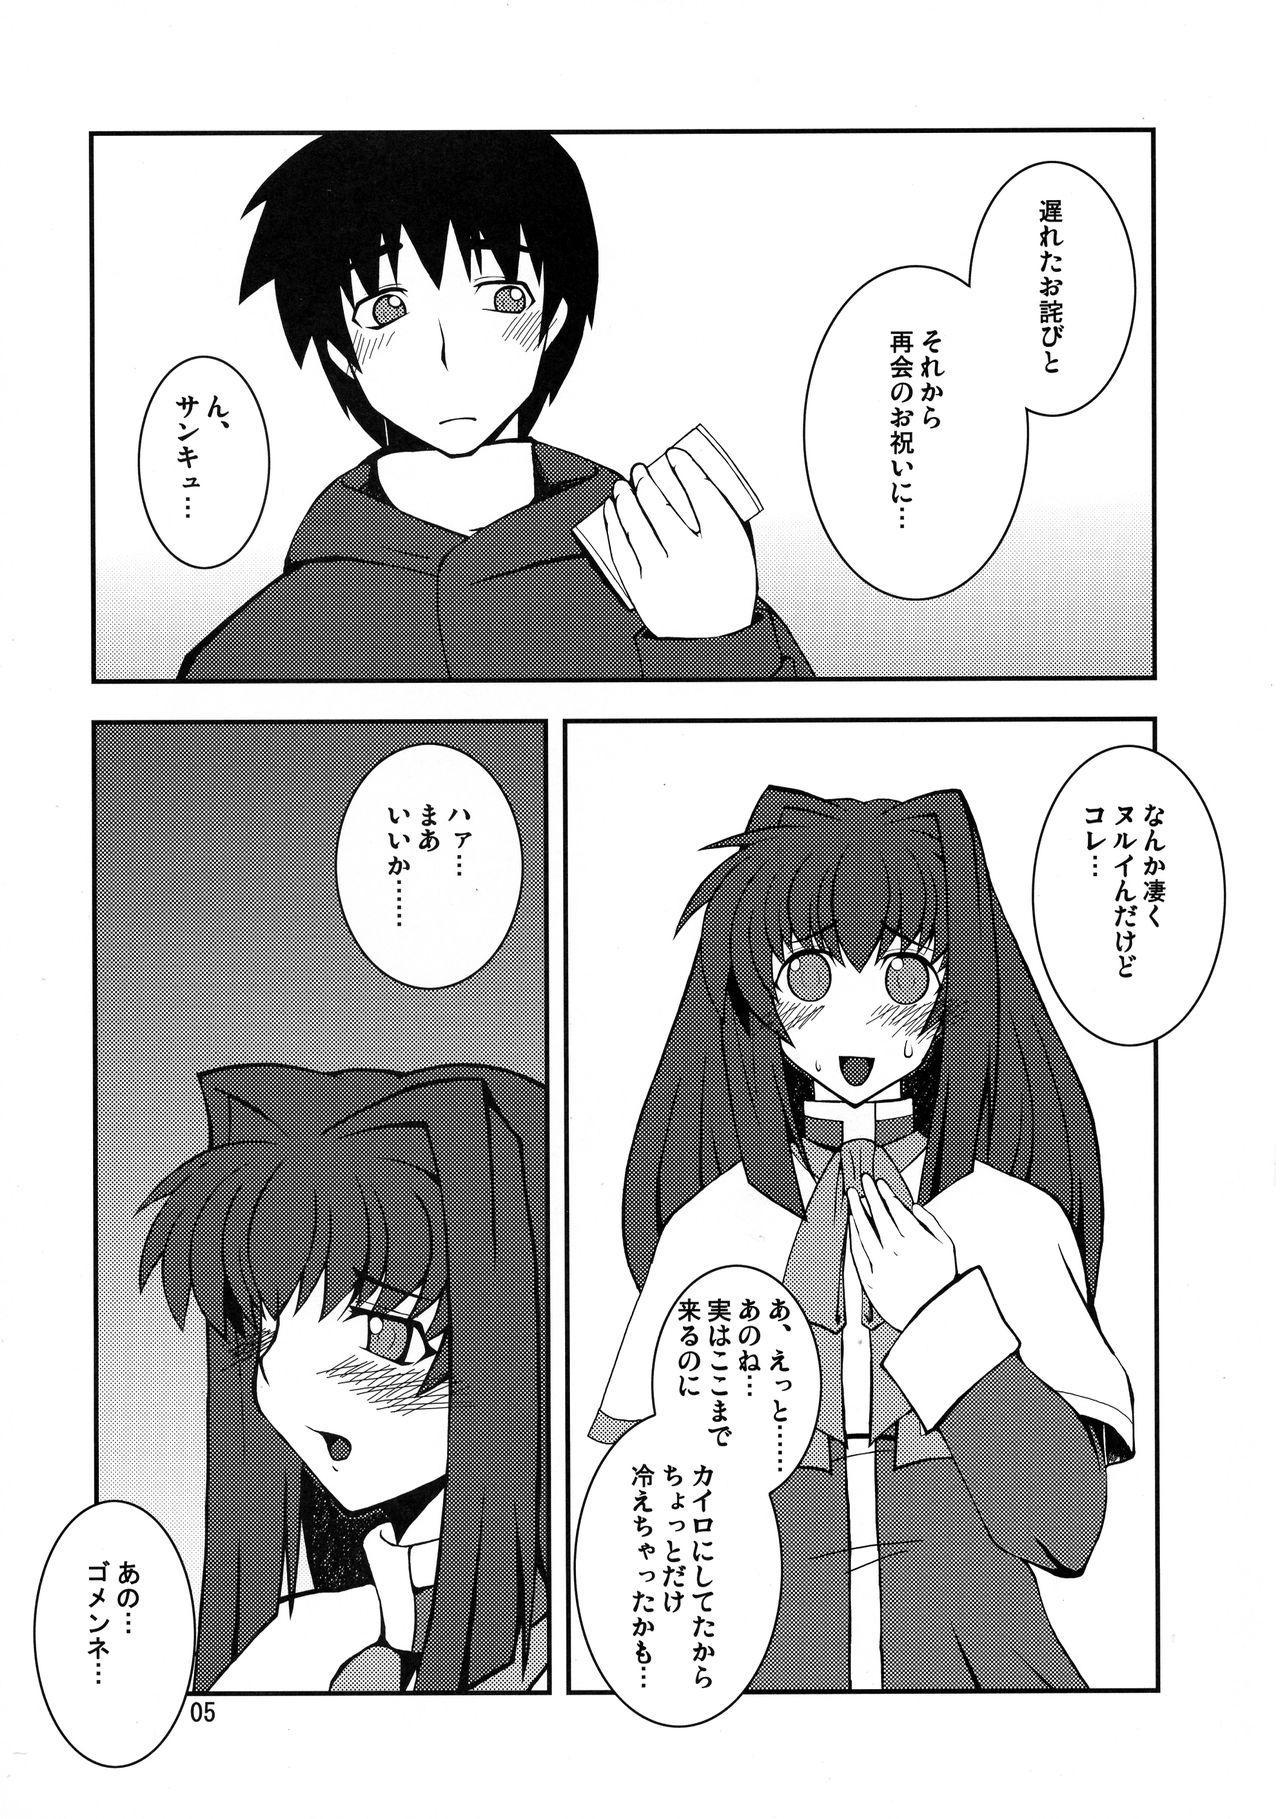 Kyouki Vol. 3~5 Remake Ver. 4